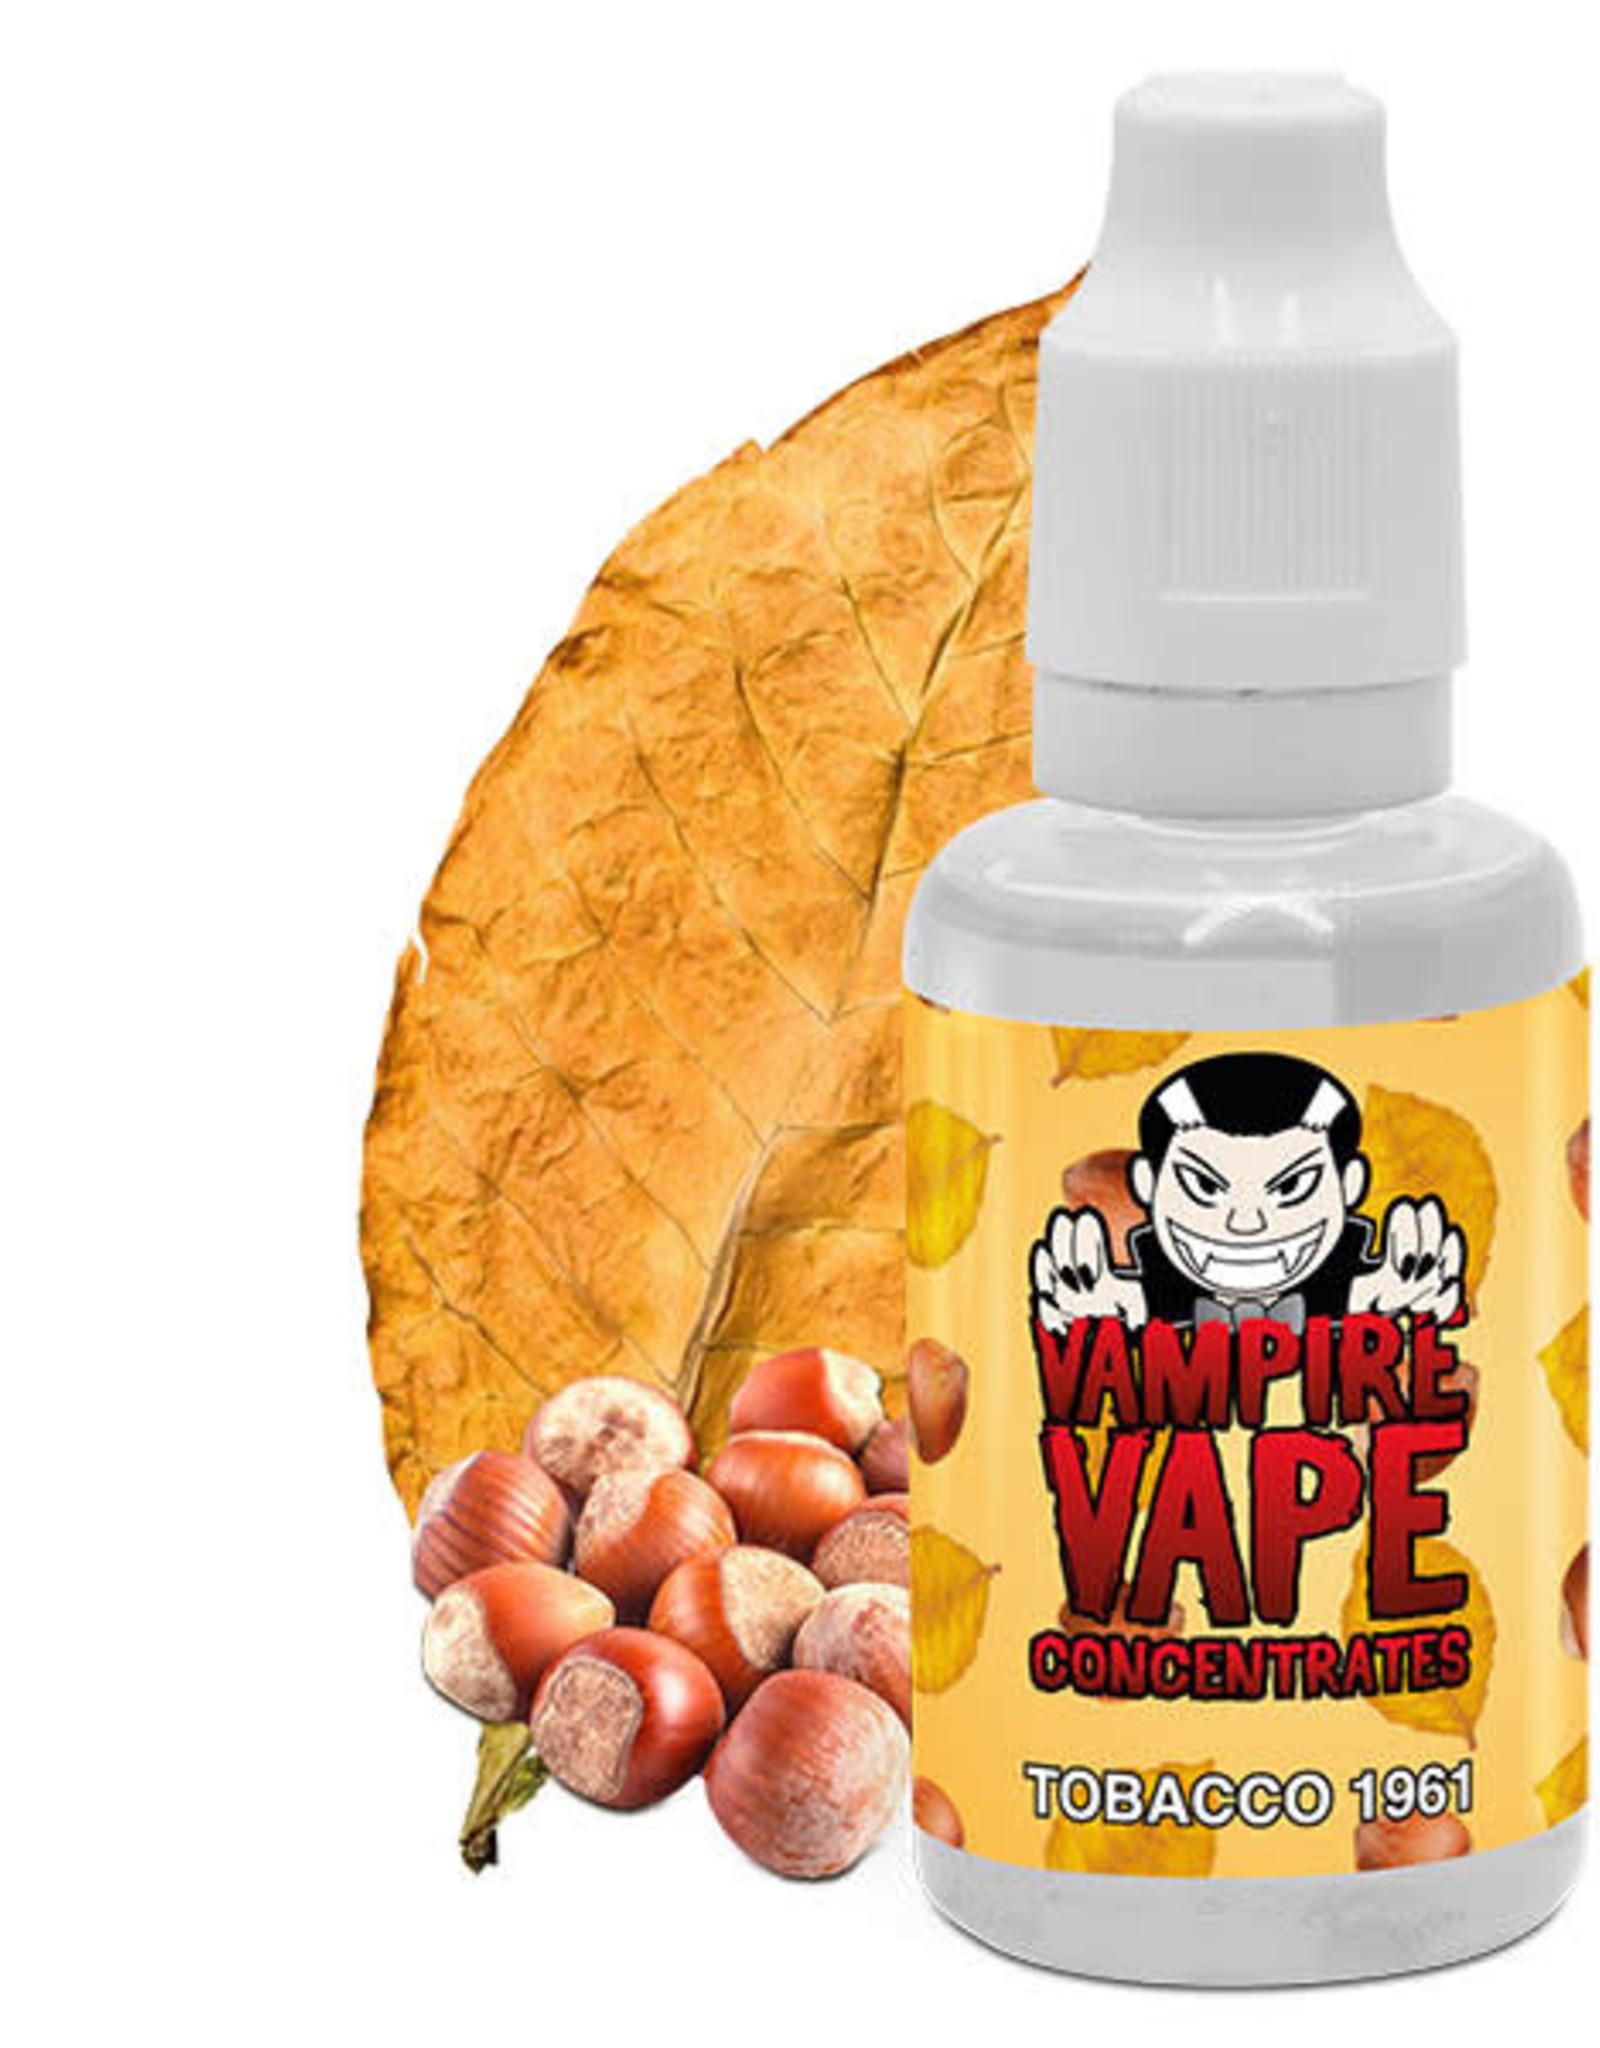 Vampire Vape Vampire Vape - Tobacco 1961 30ml